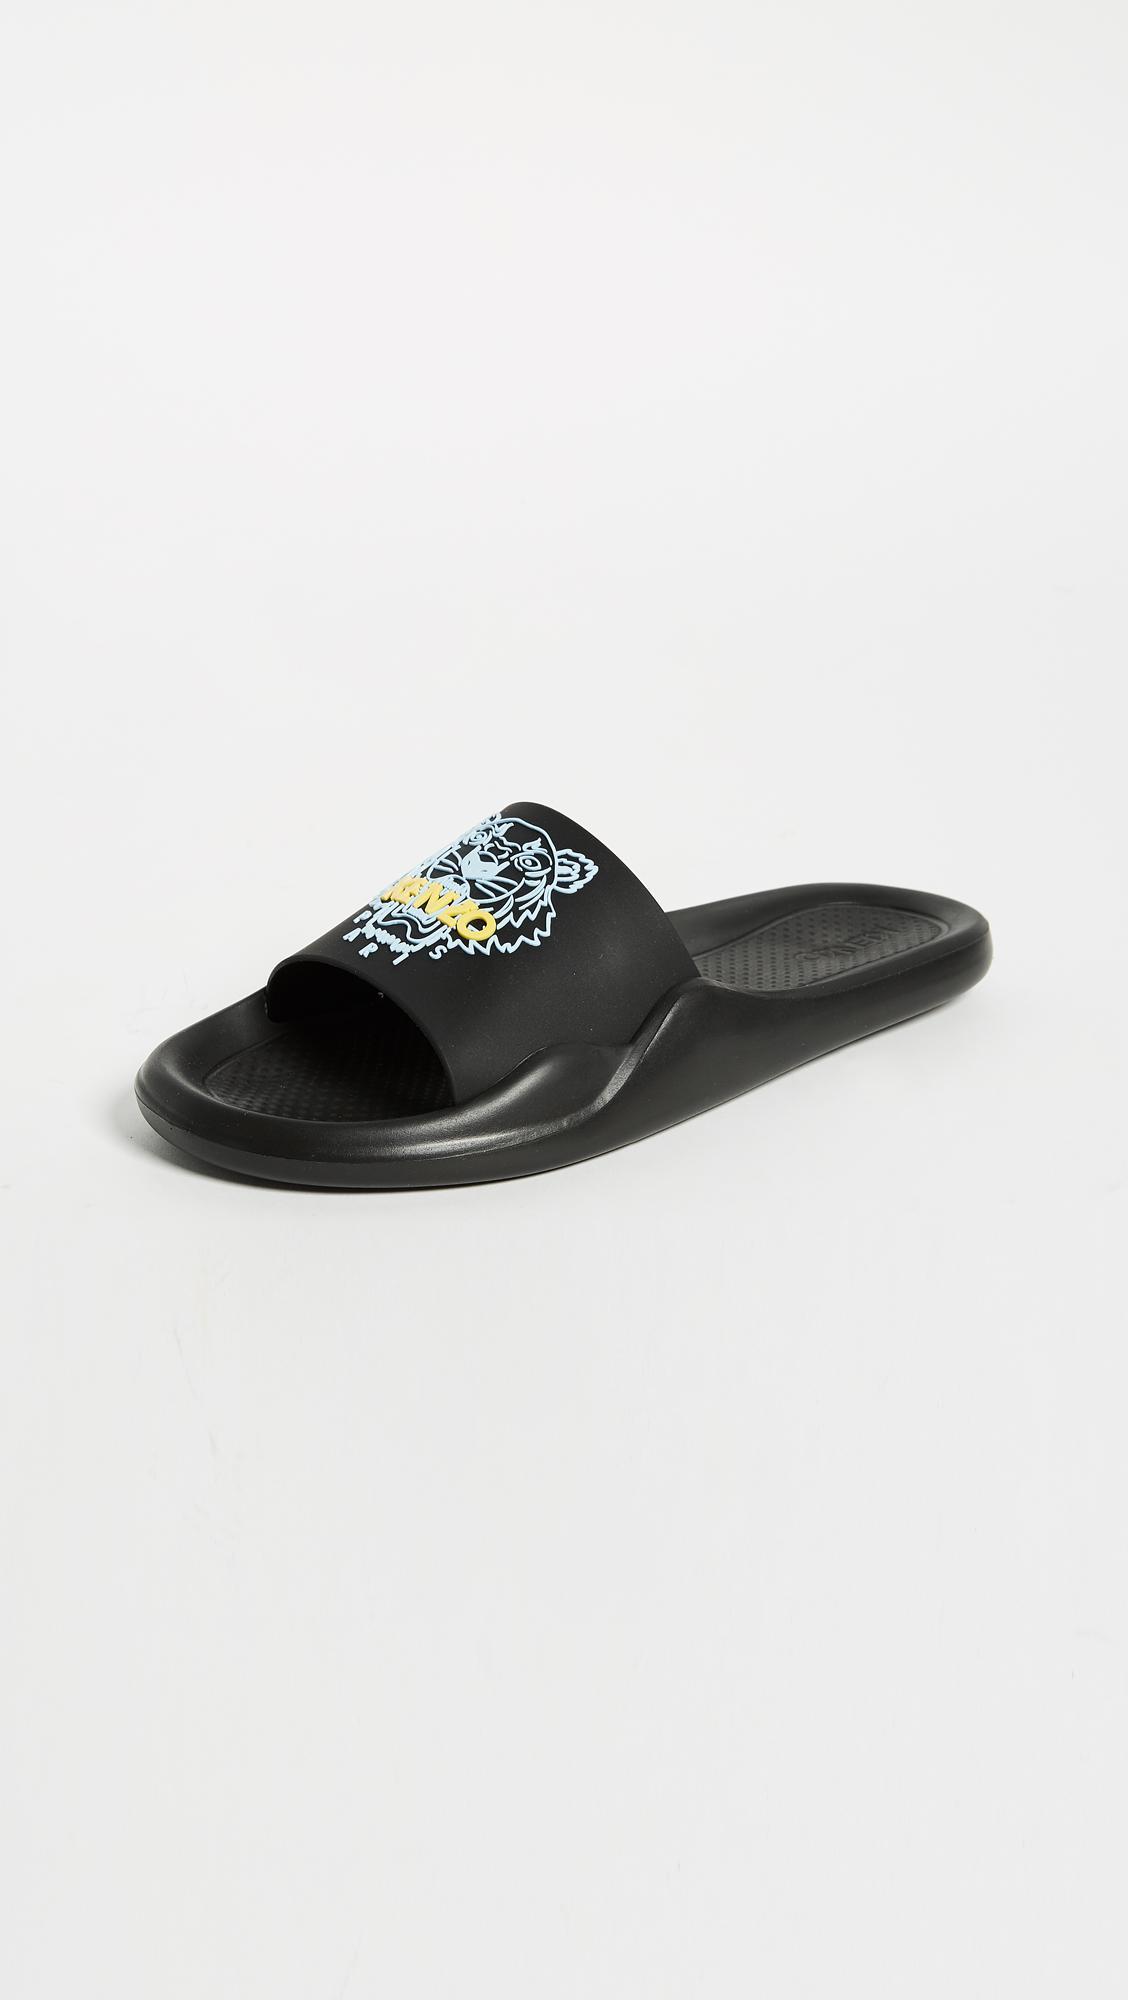 39.5 EU  38 EU Kenzo Mules POOL Kenzo soldes  Bottes Femme adidas ACE 16.1 FG - Bottes de Football pour Homme  Marron (Chestnut/White 283) dTuPGuIA